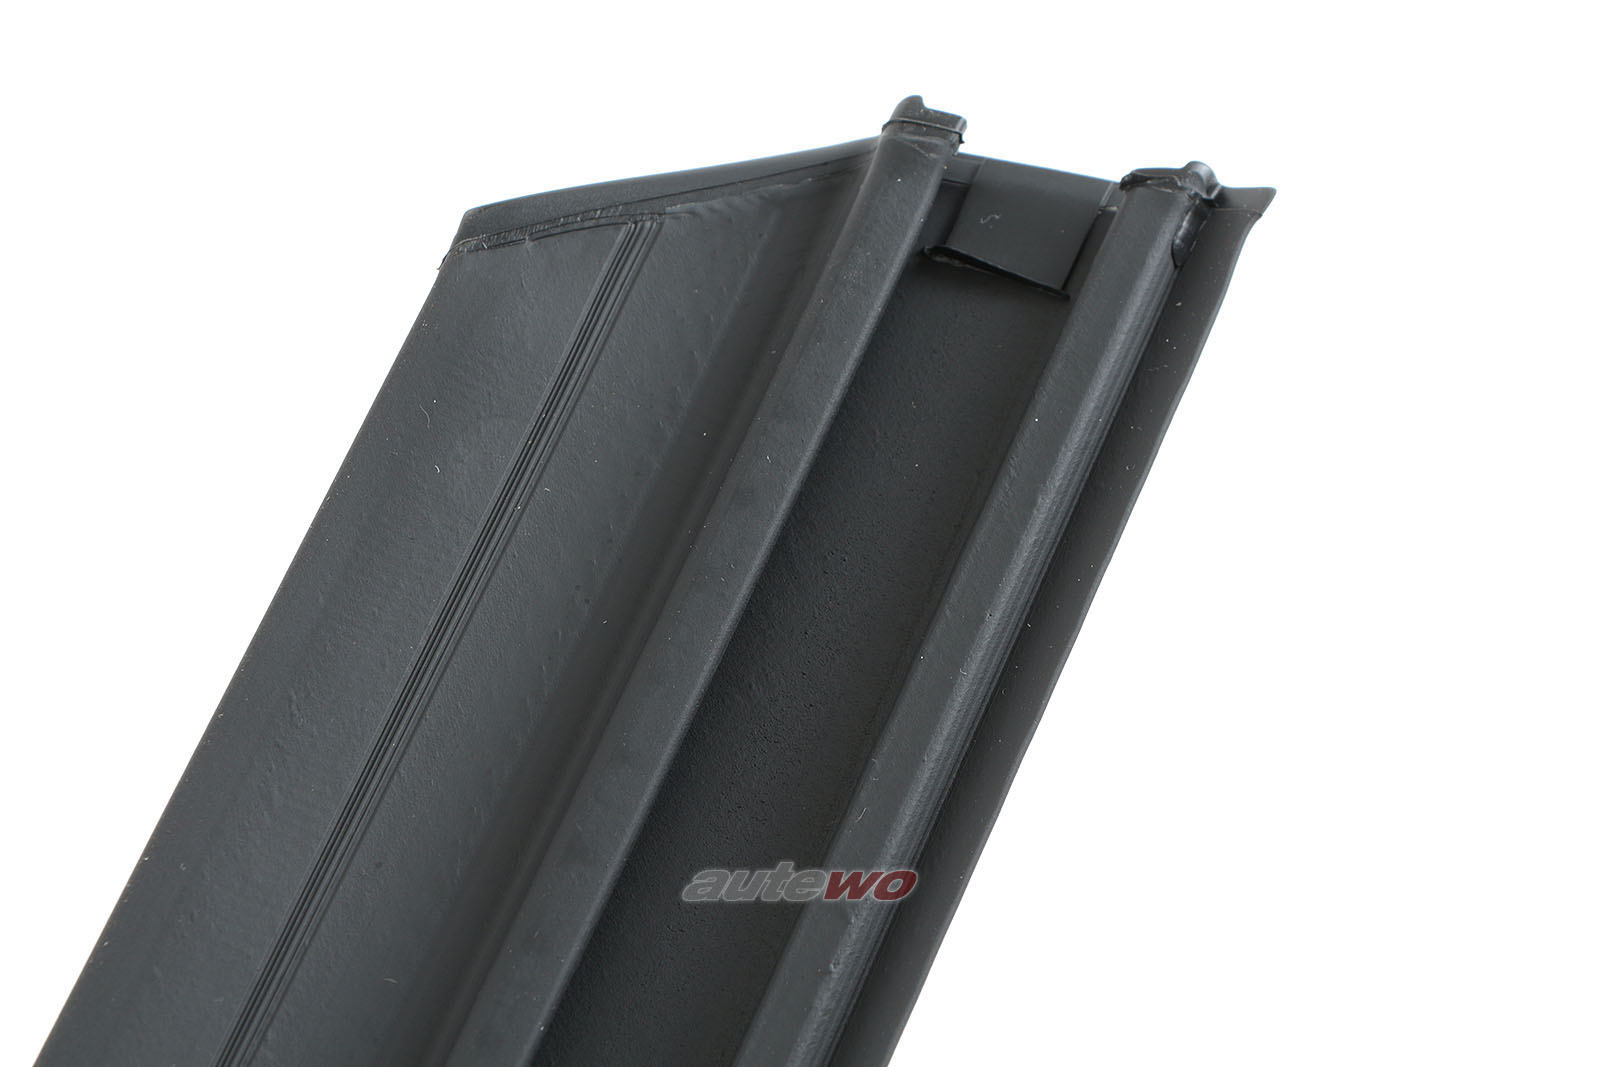 893853970b neu audi 80 90 typ 89 b4 s2 t rabschlussleiste. Black Bedroom Furniture Sets. Home Design Ideas